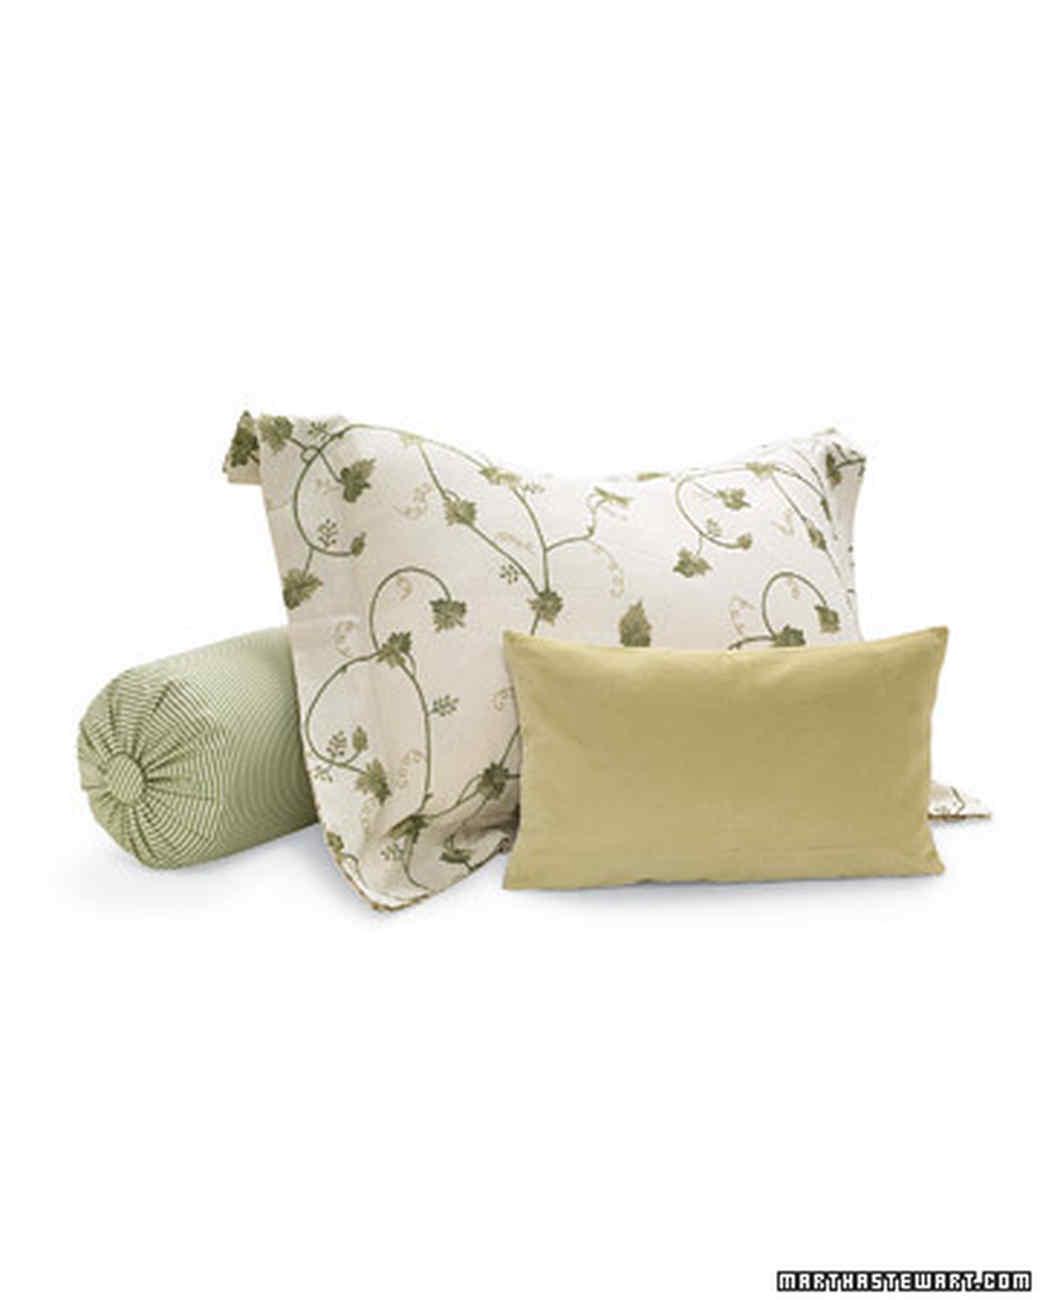 msl_sept06_decorate_pillows_l.jpg